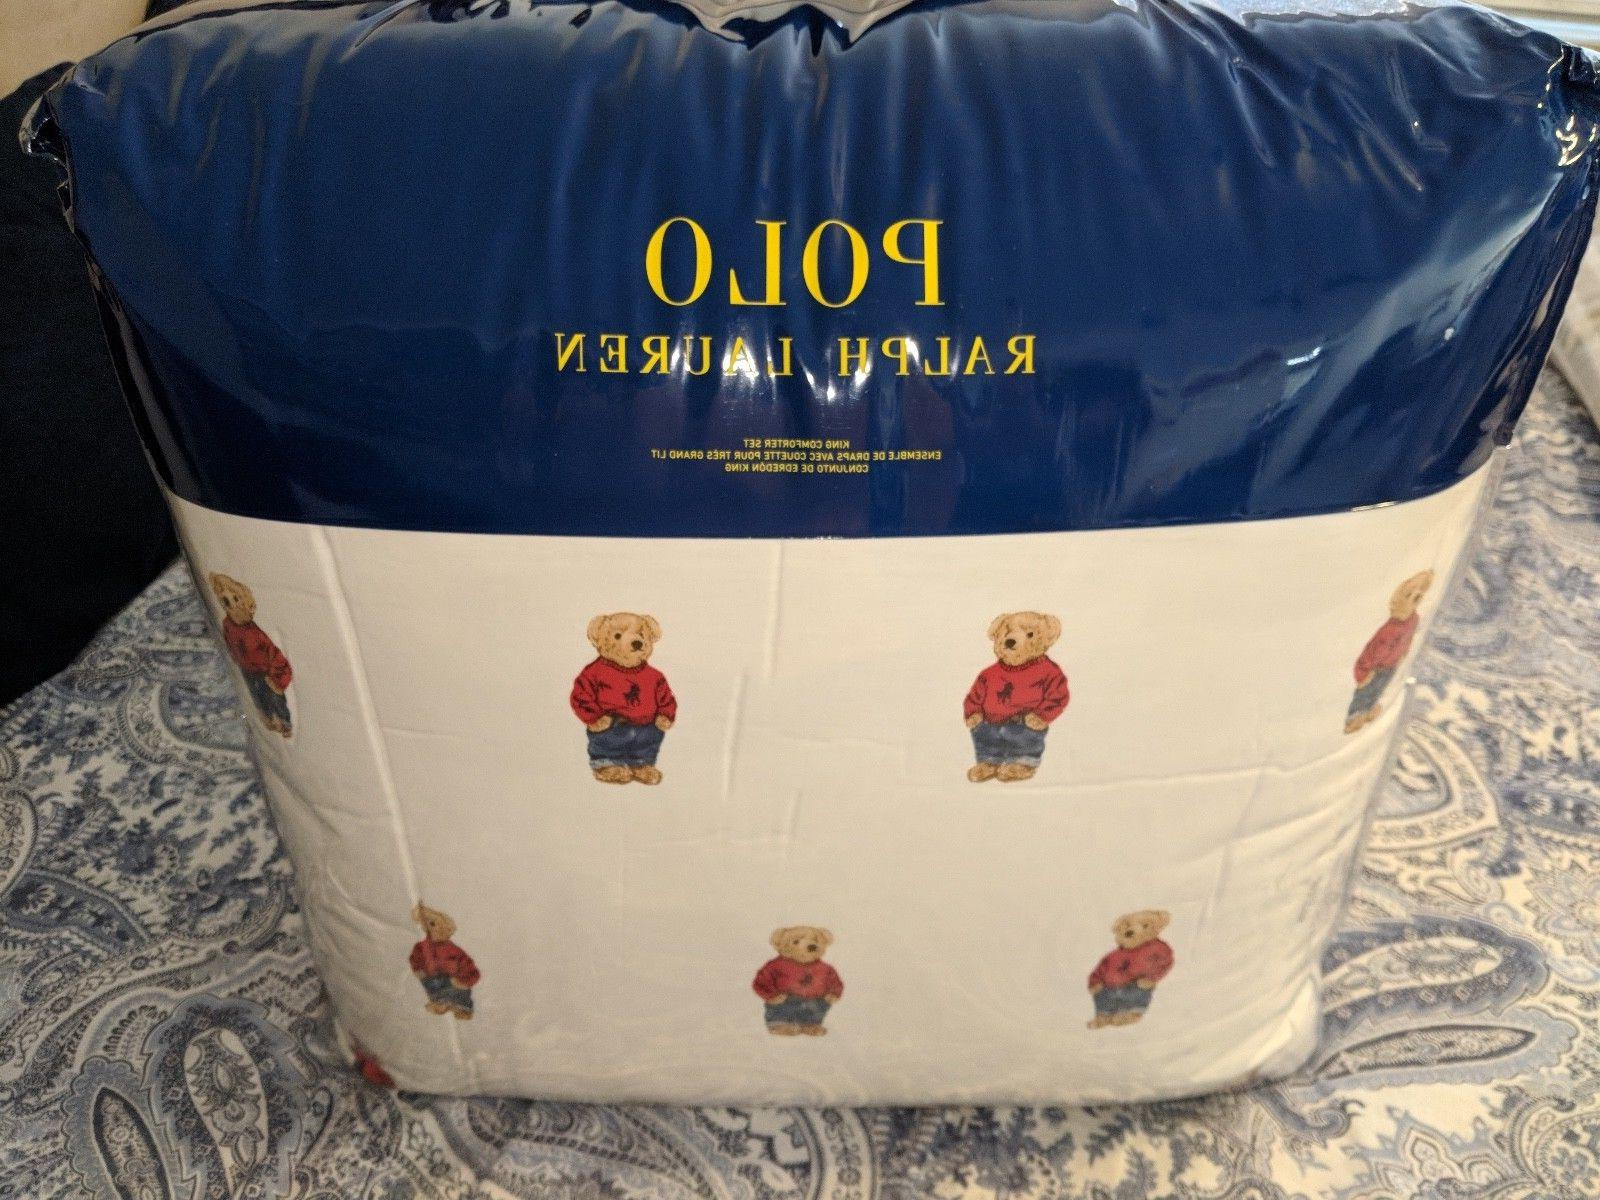 Ralph Lauren Polo Teddy Bear King Comforter SET Boy NWT with